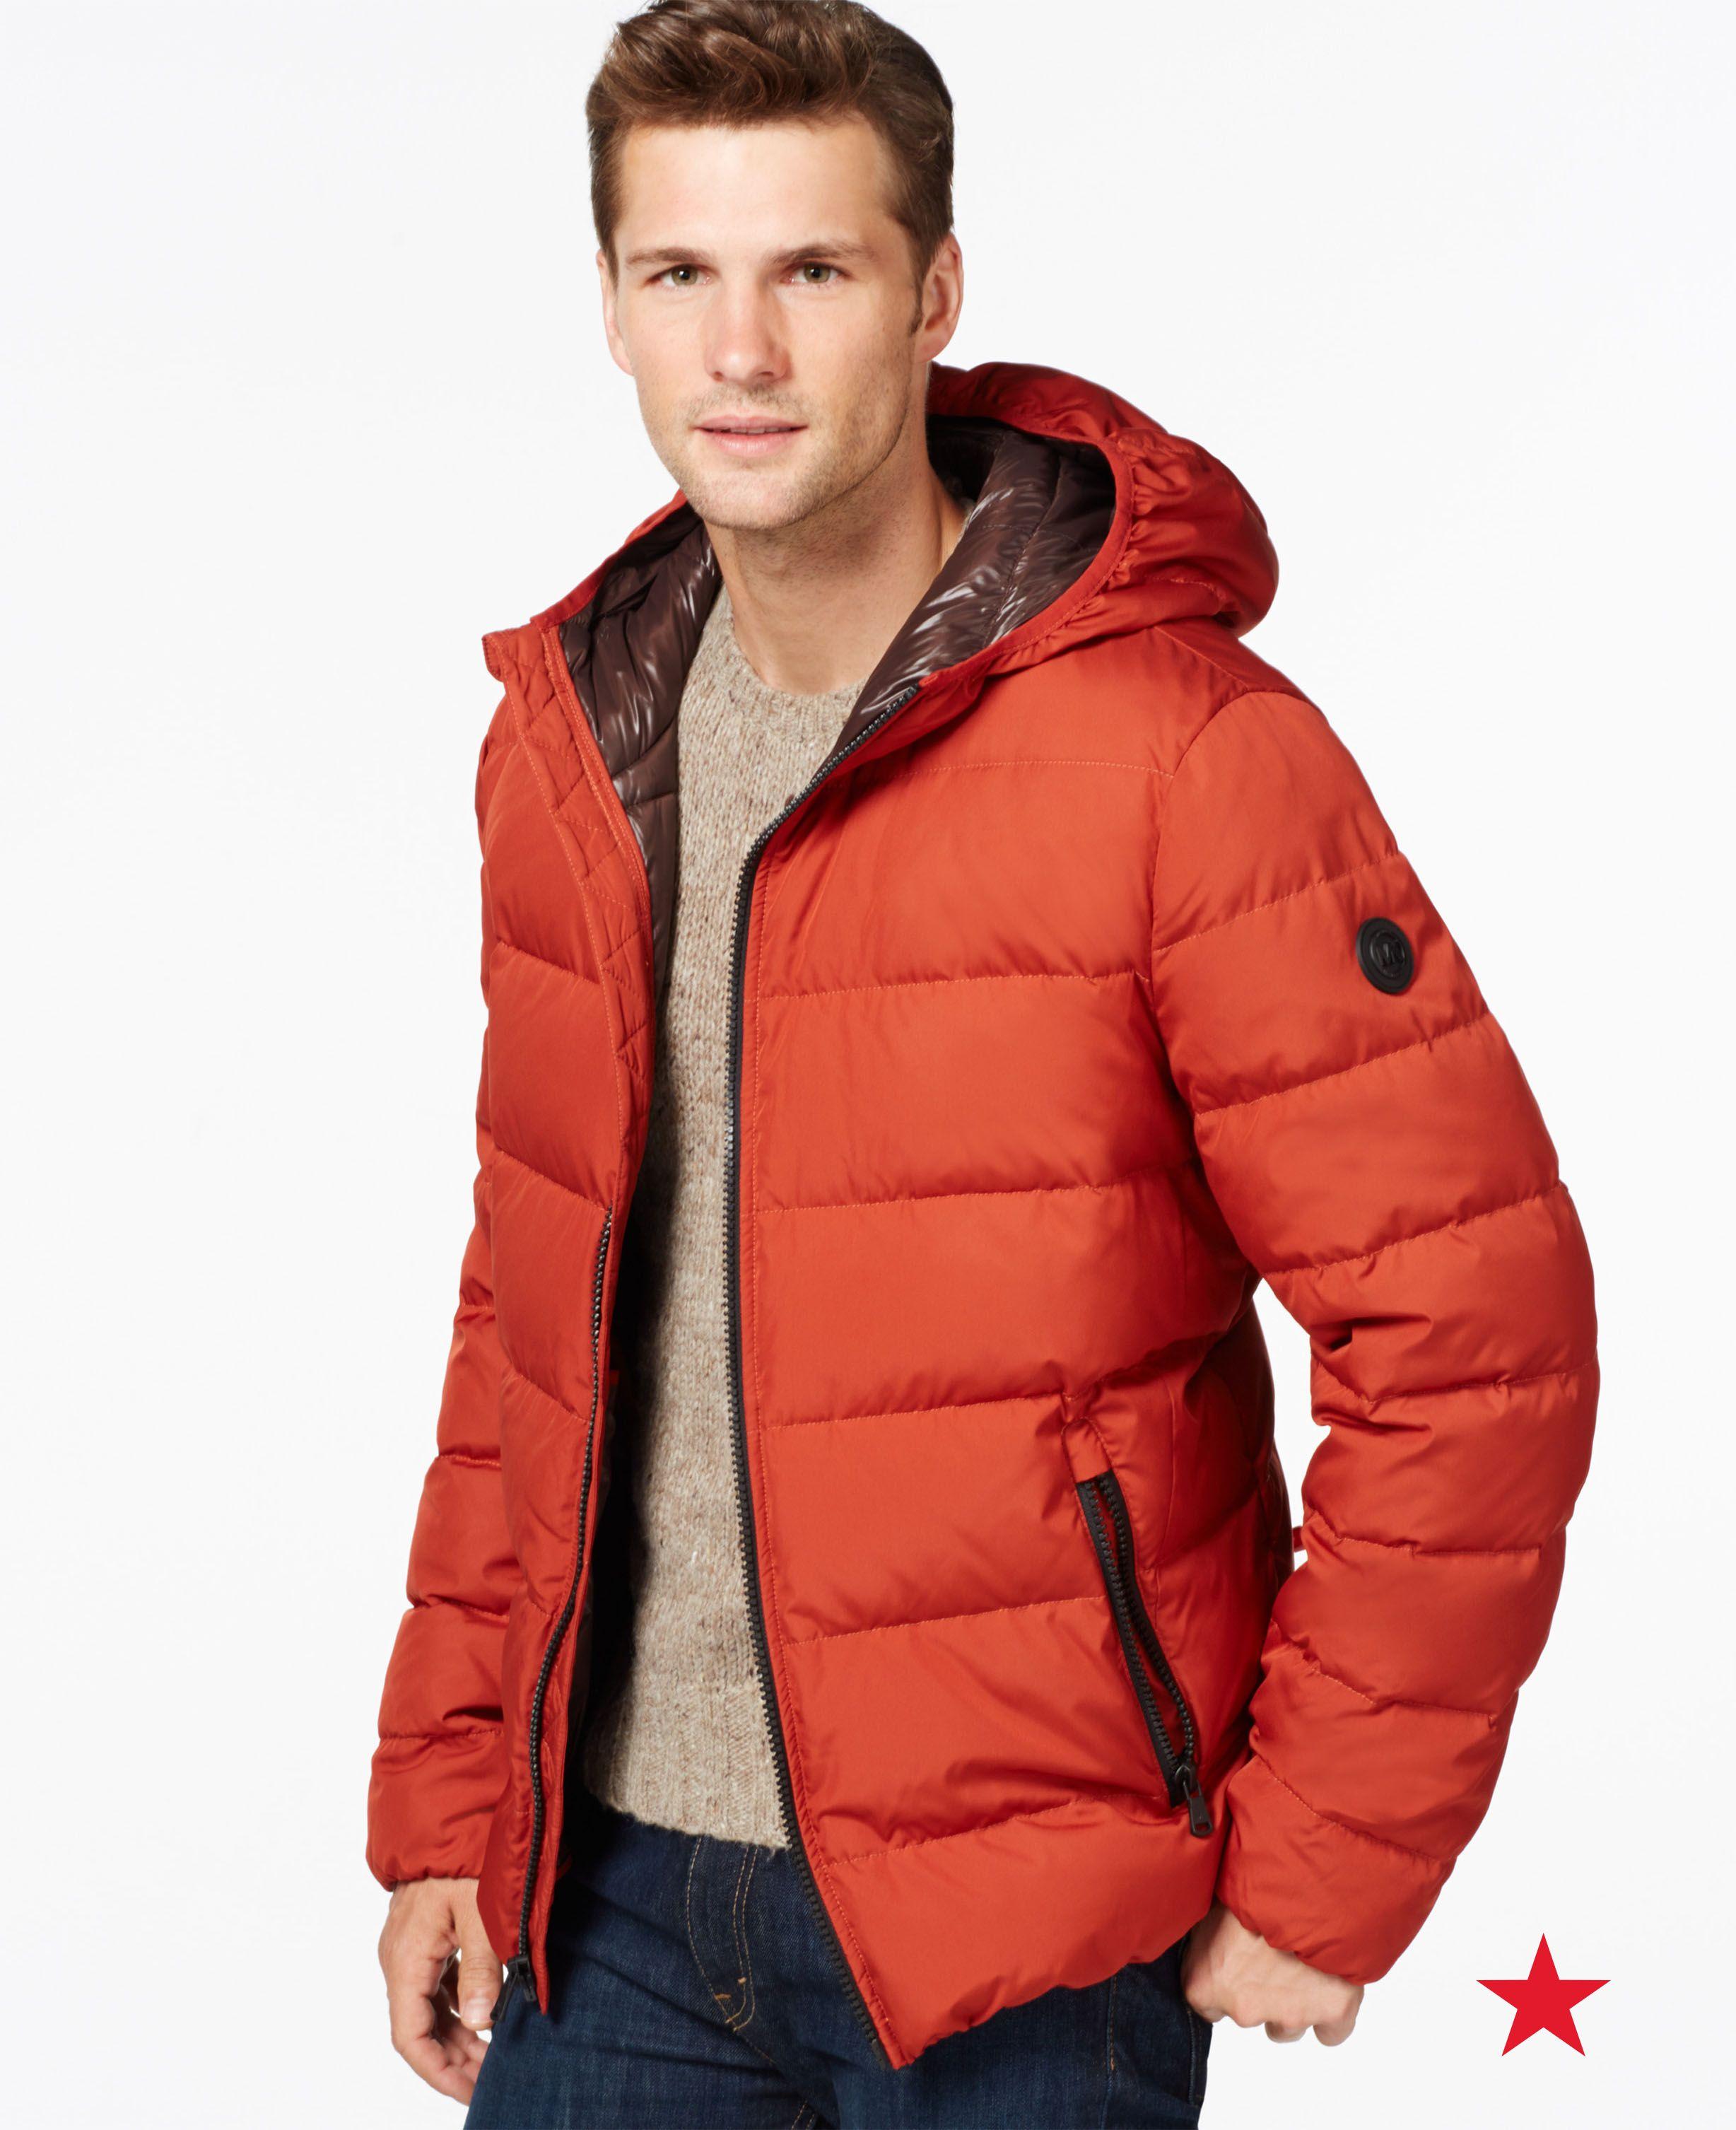 Michael Kors Michael Kors Men S Down Puffer Jacket Created For Macy S Reviews Coats Jackets Men Macy S Michael Kors Men Jackets Men Fashion Michael Kors Clothes [ 3013 x 2456 Pixel ]